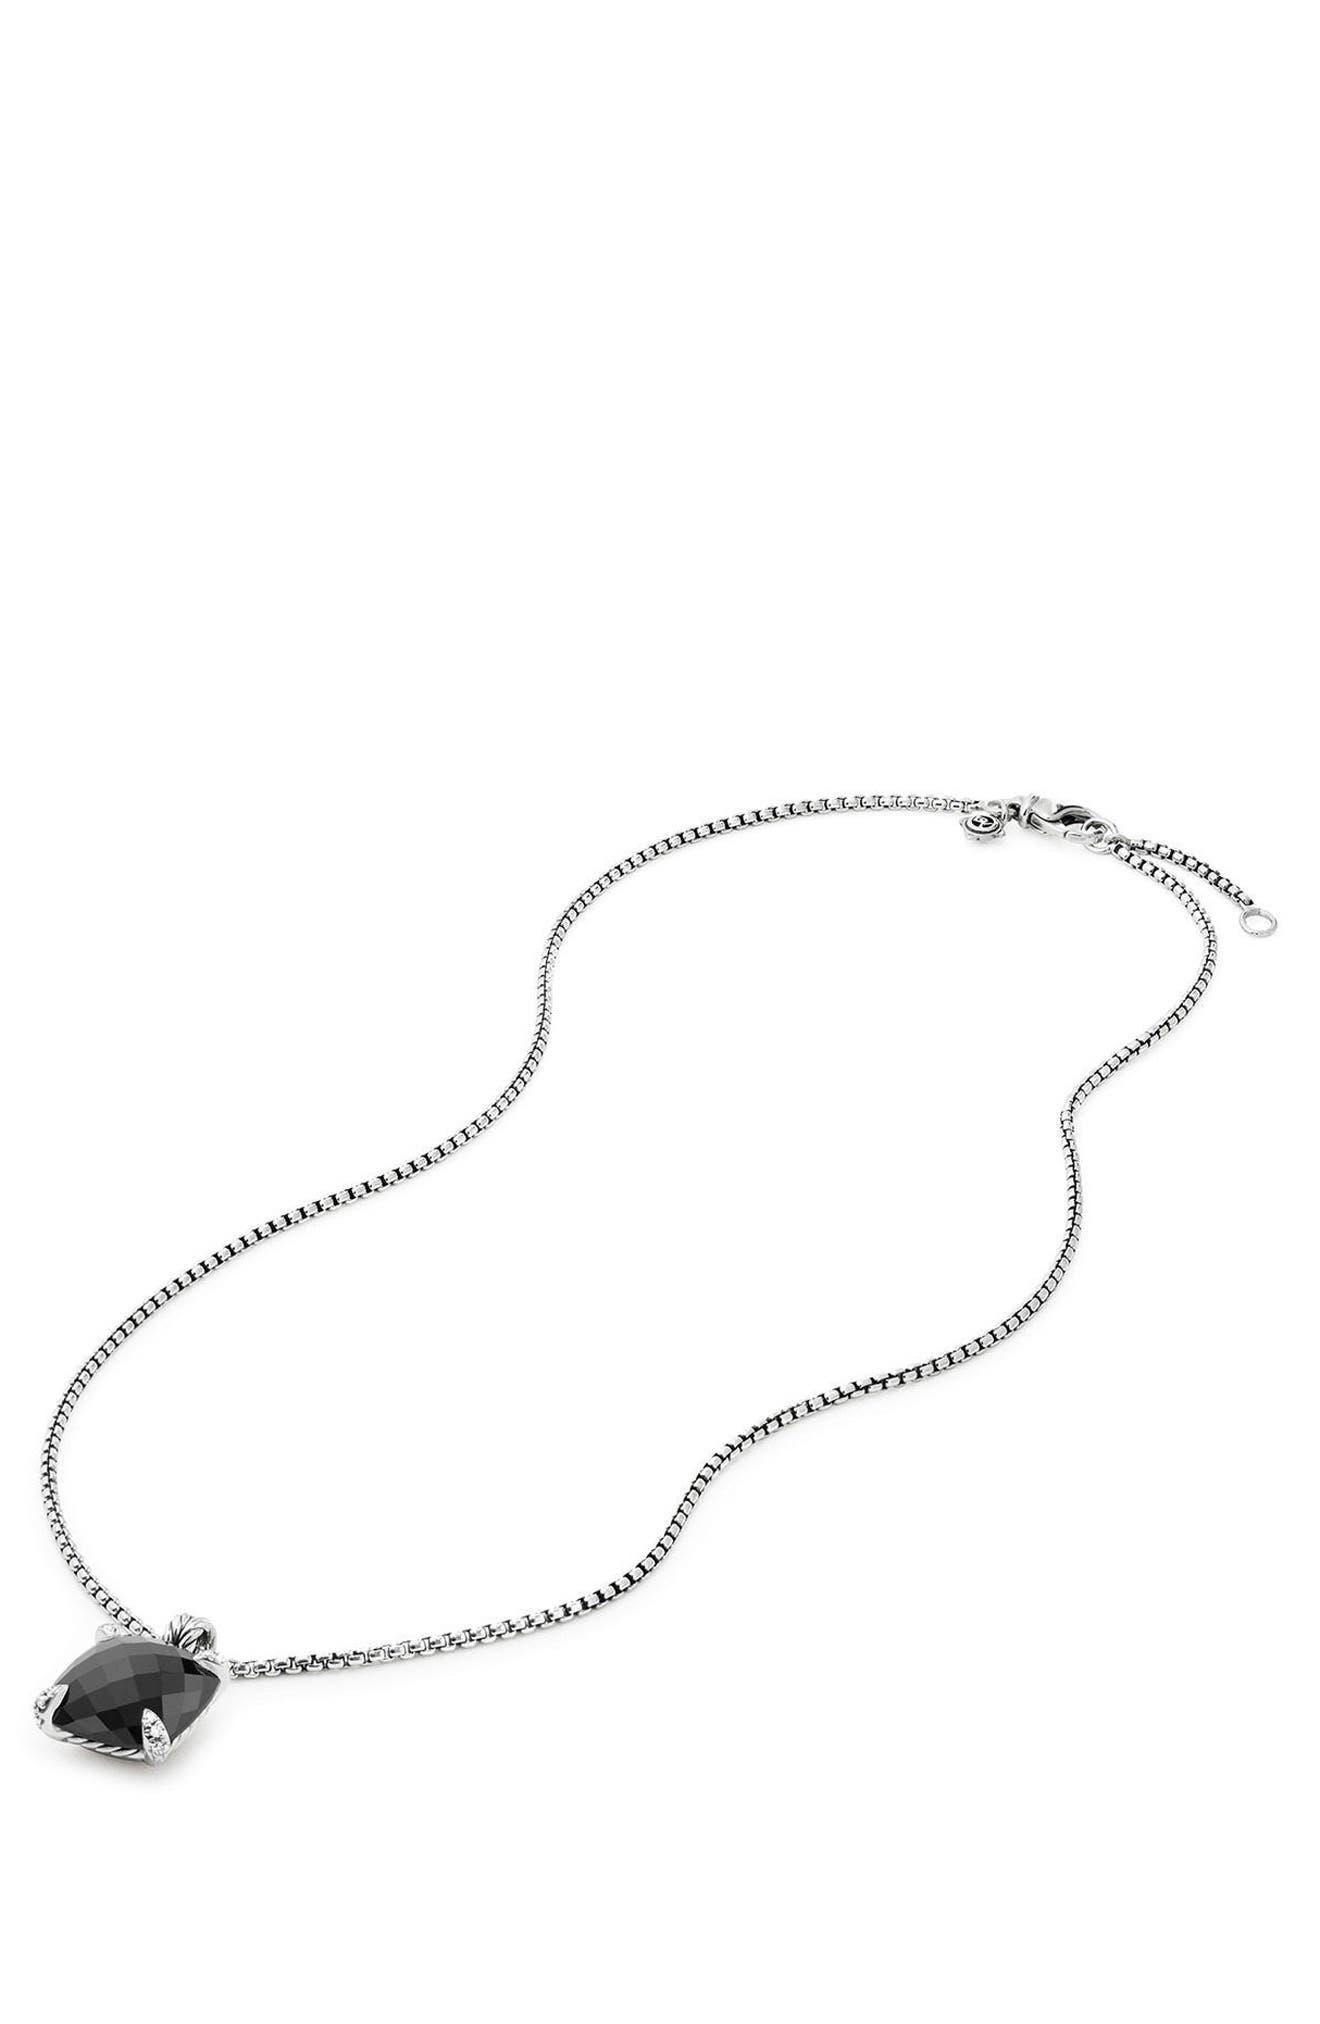 david yurman ch226telaine pendant necklace with diamonds